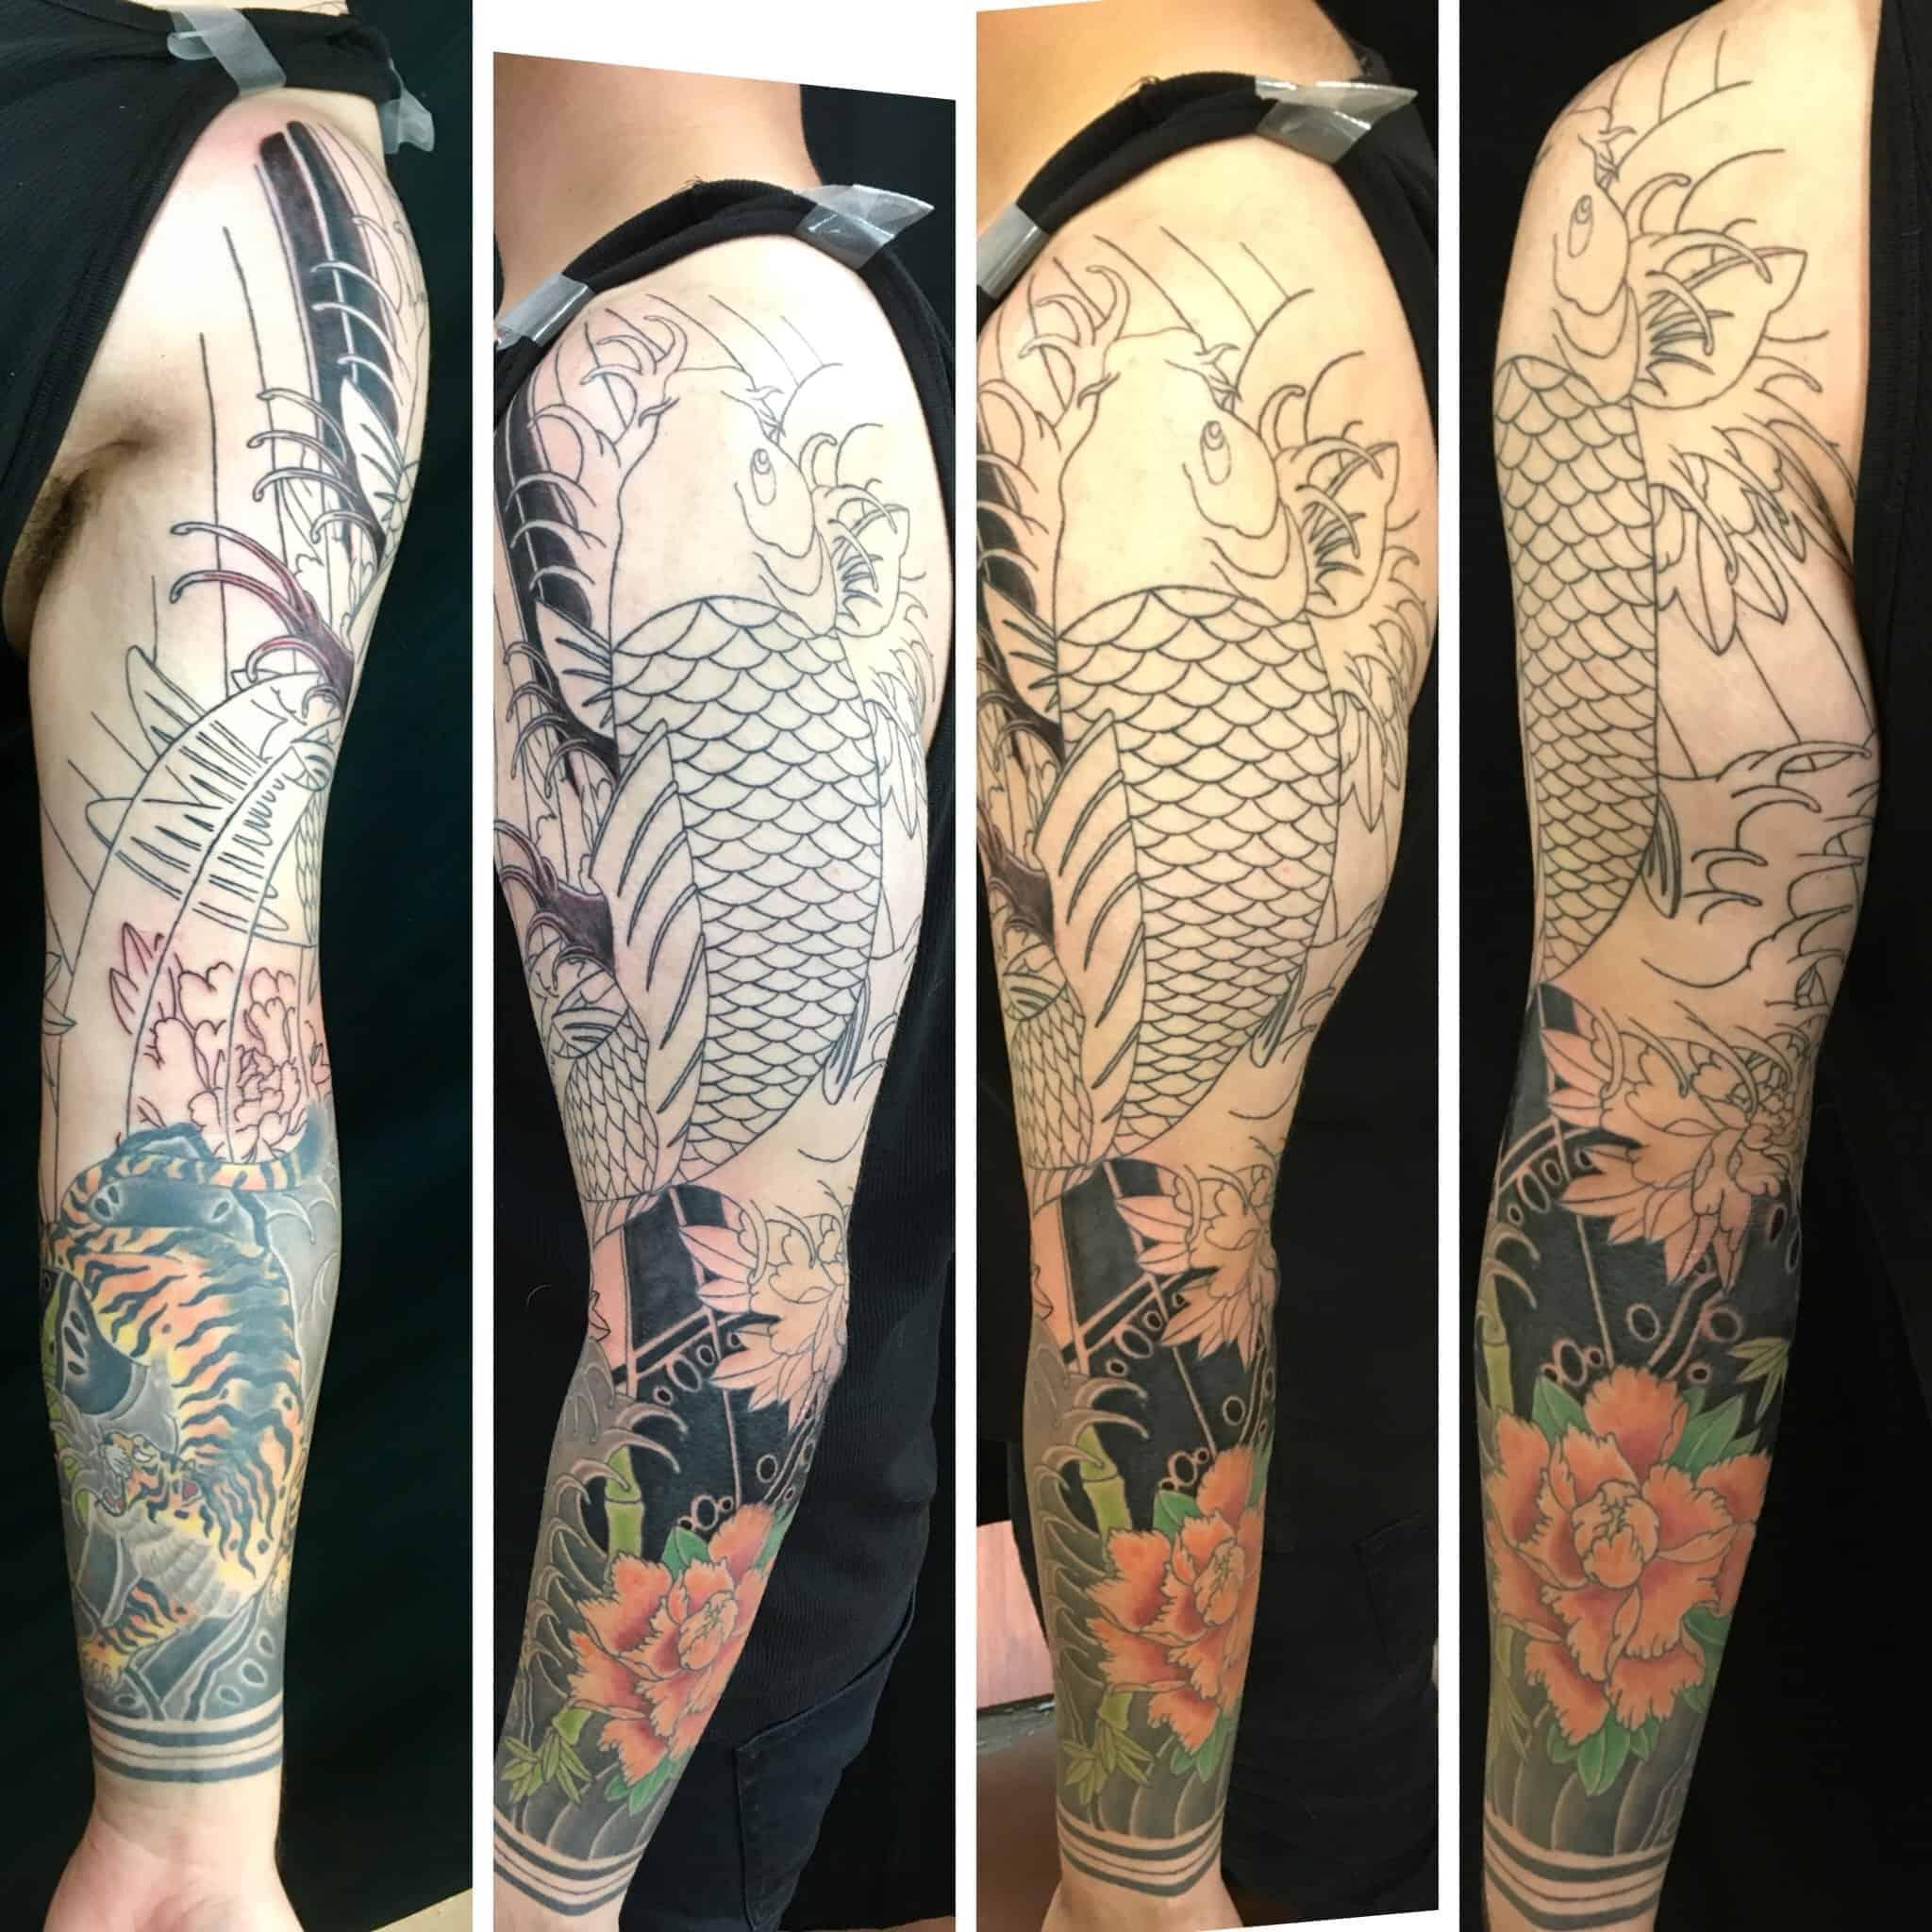 Japanese-style-sleeve-with-Koi-tiger-and-peony-by-Ei-Omiya